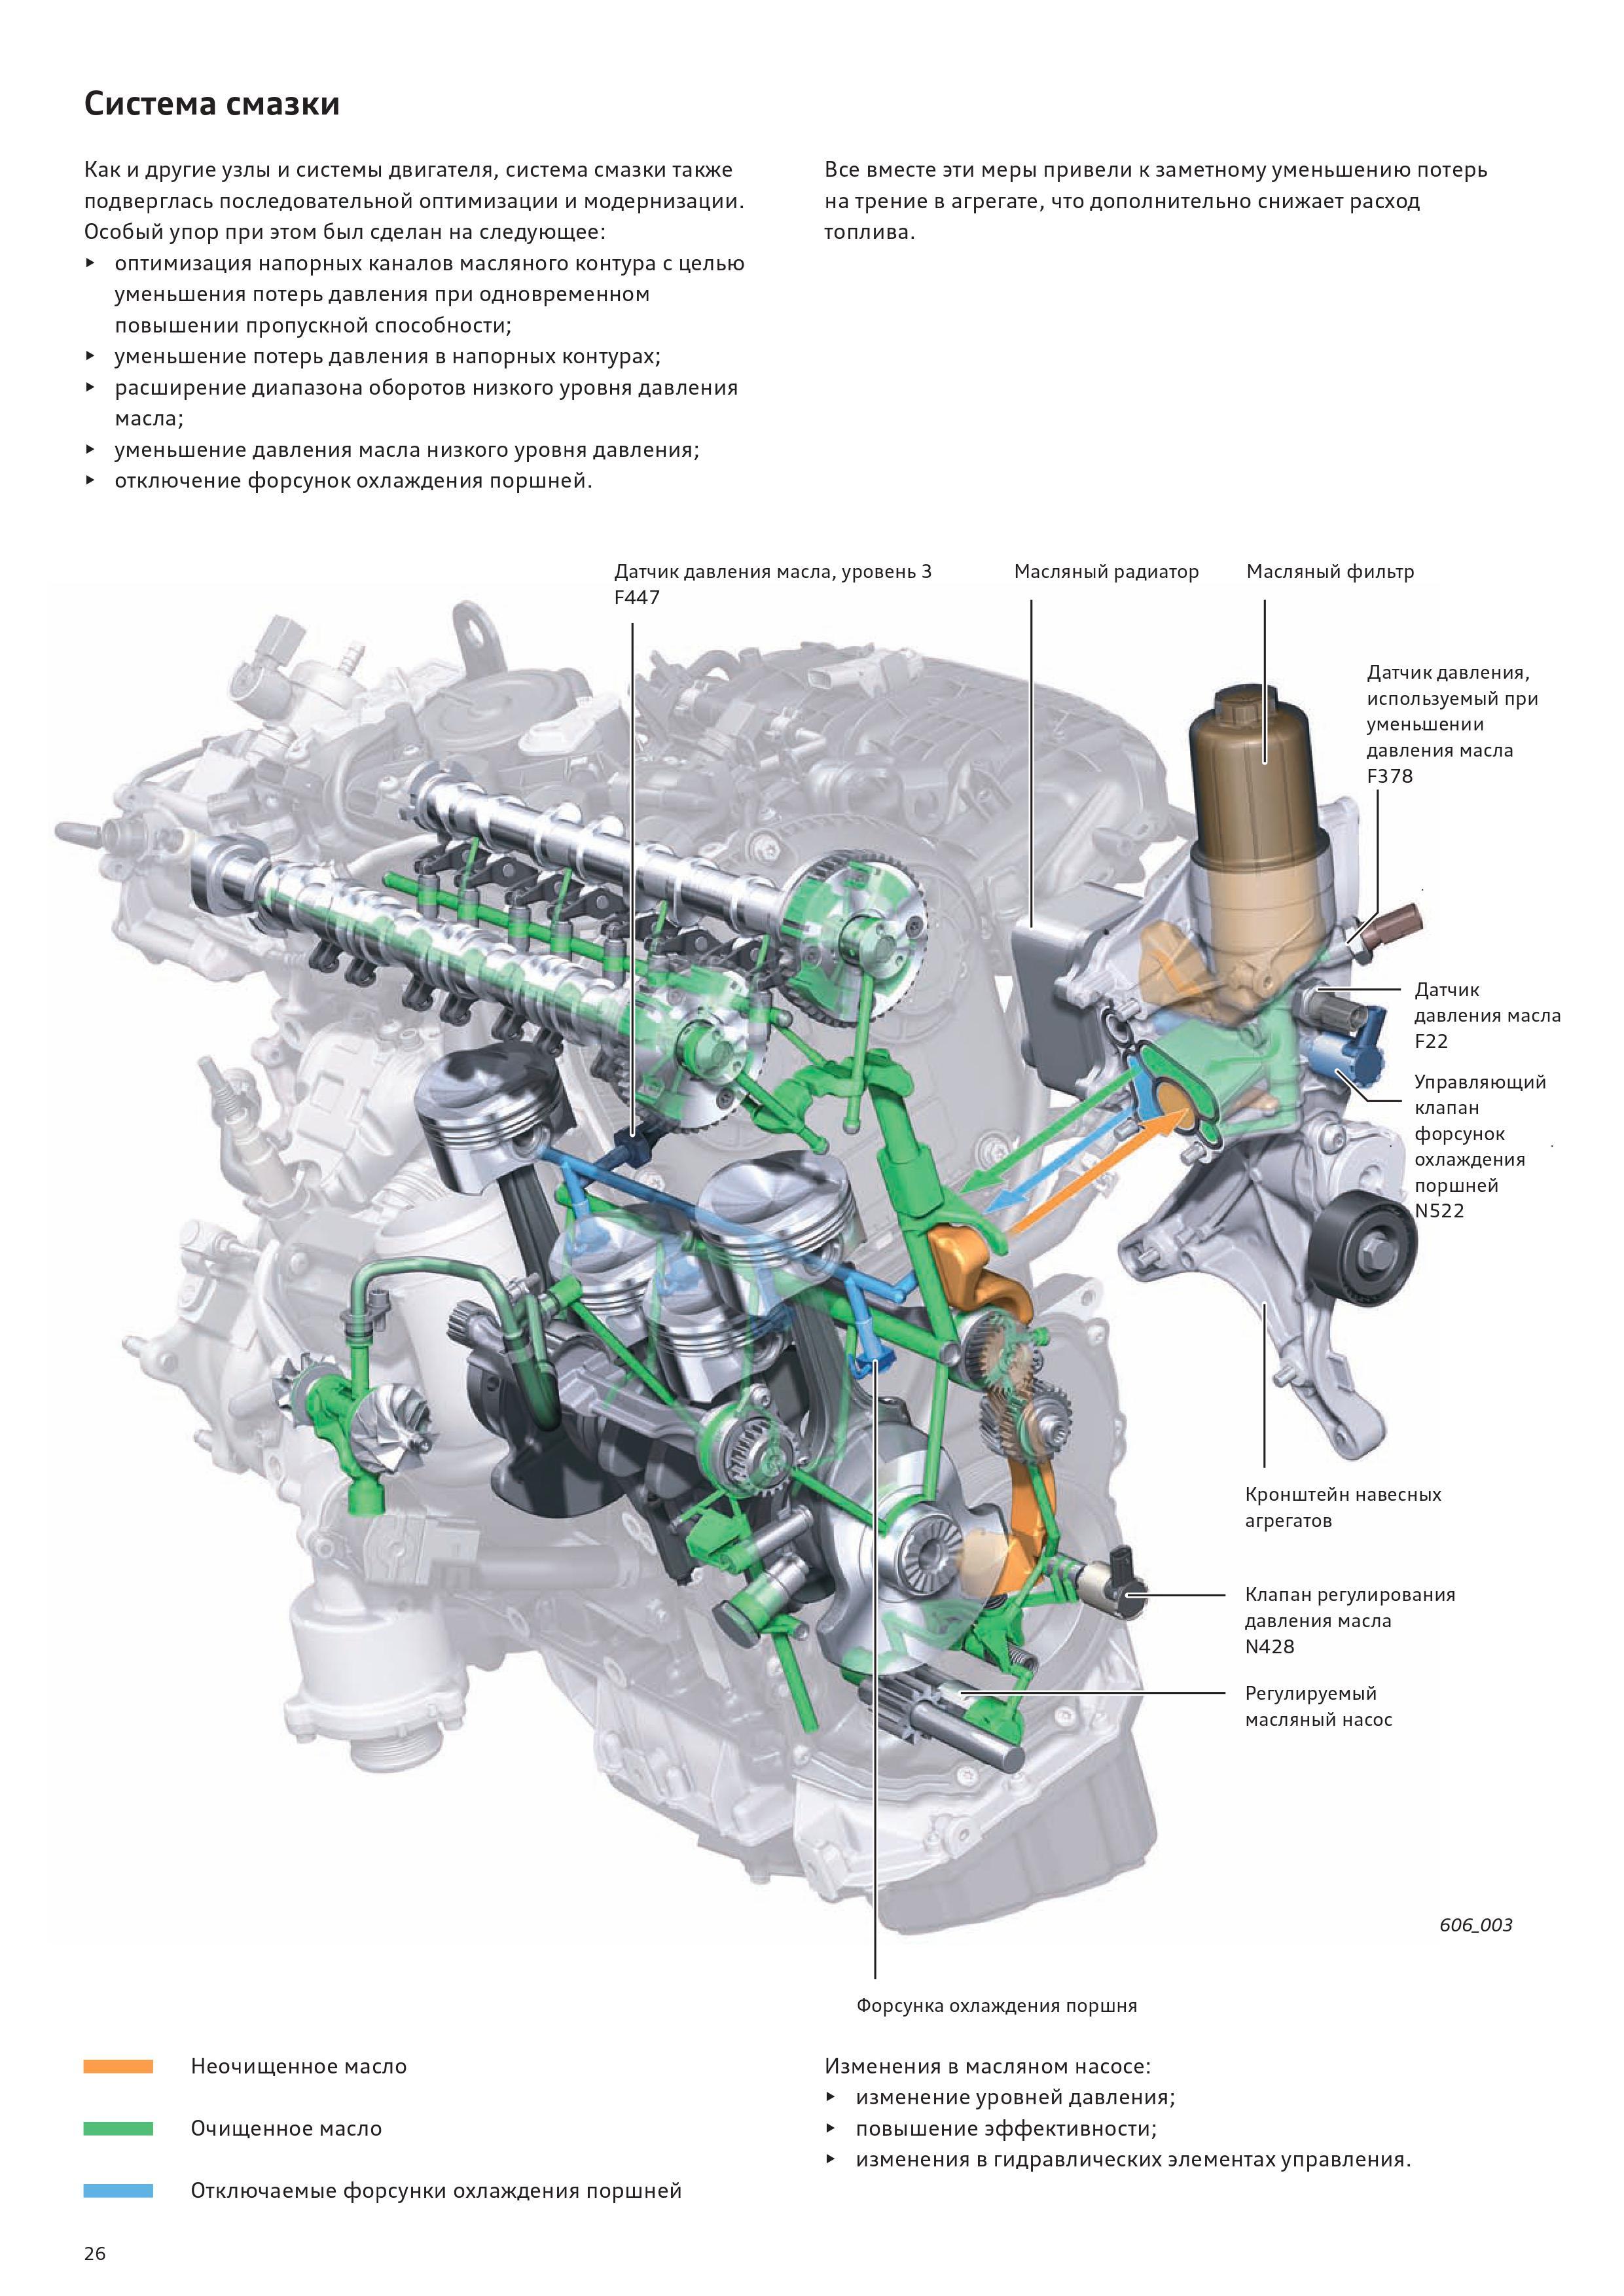 Схема двигатель 2.0 tfsi